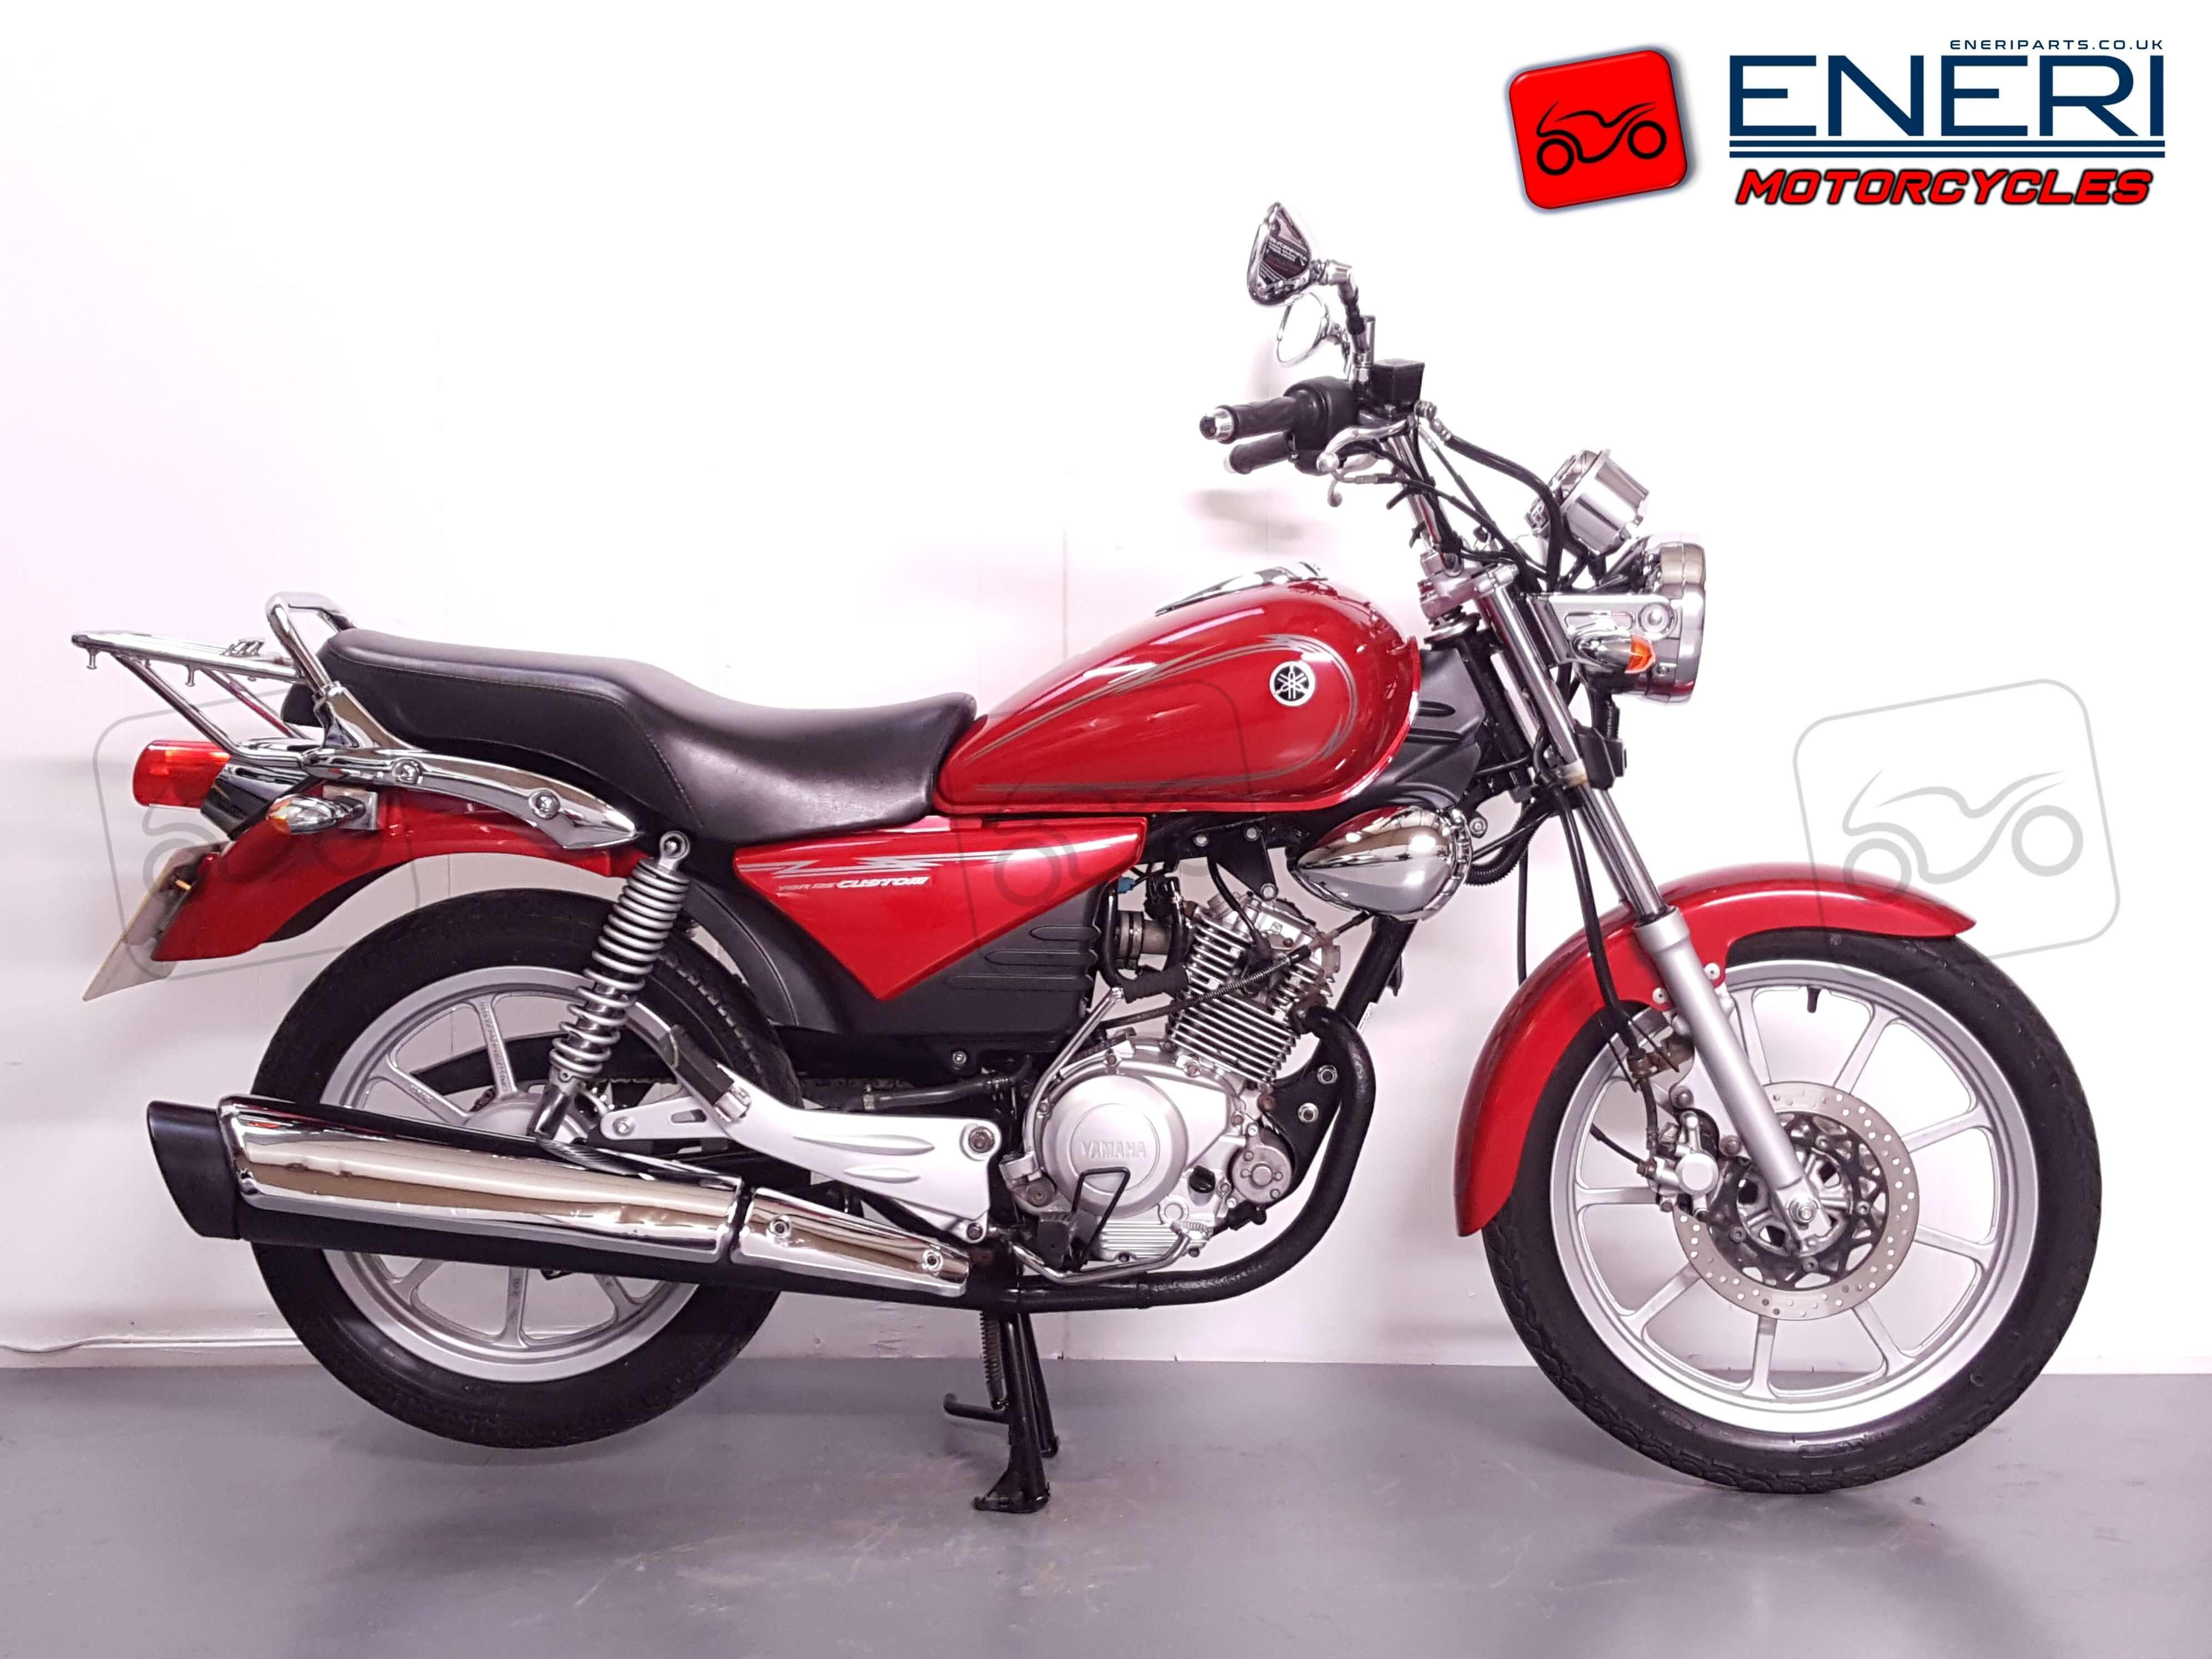 2012 yamaha ybr125 custom eneri motorcycle parts. Black Bedroom Furniture Sets. Home Design Ideas